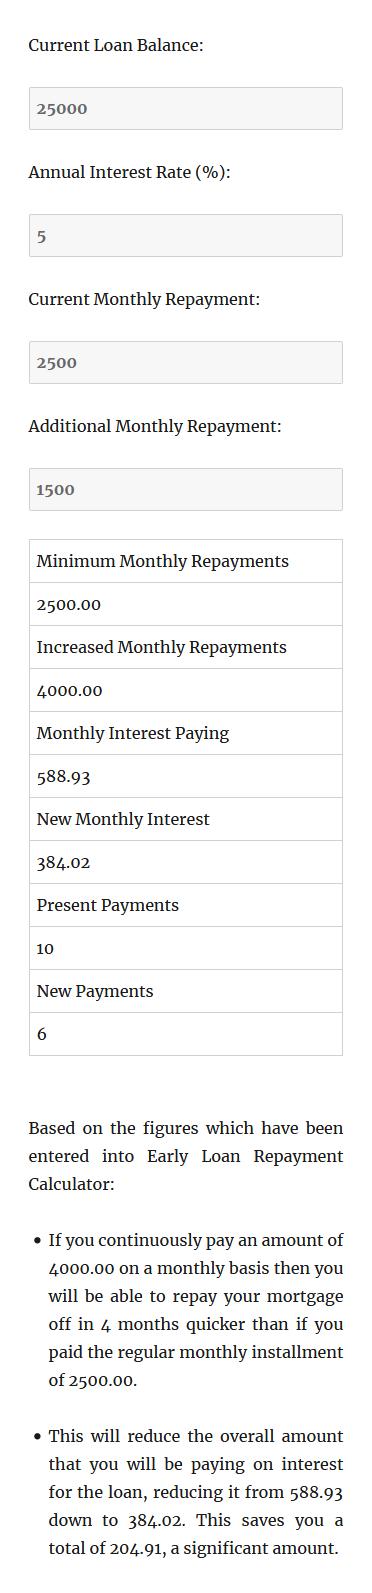 Early Loan Repayment Calculator for WordPress by tawhidurrahmandear